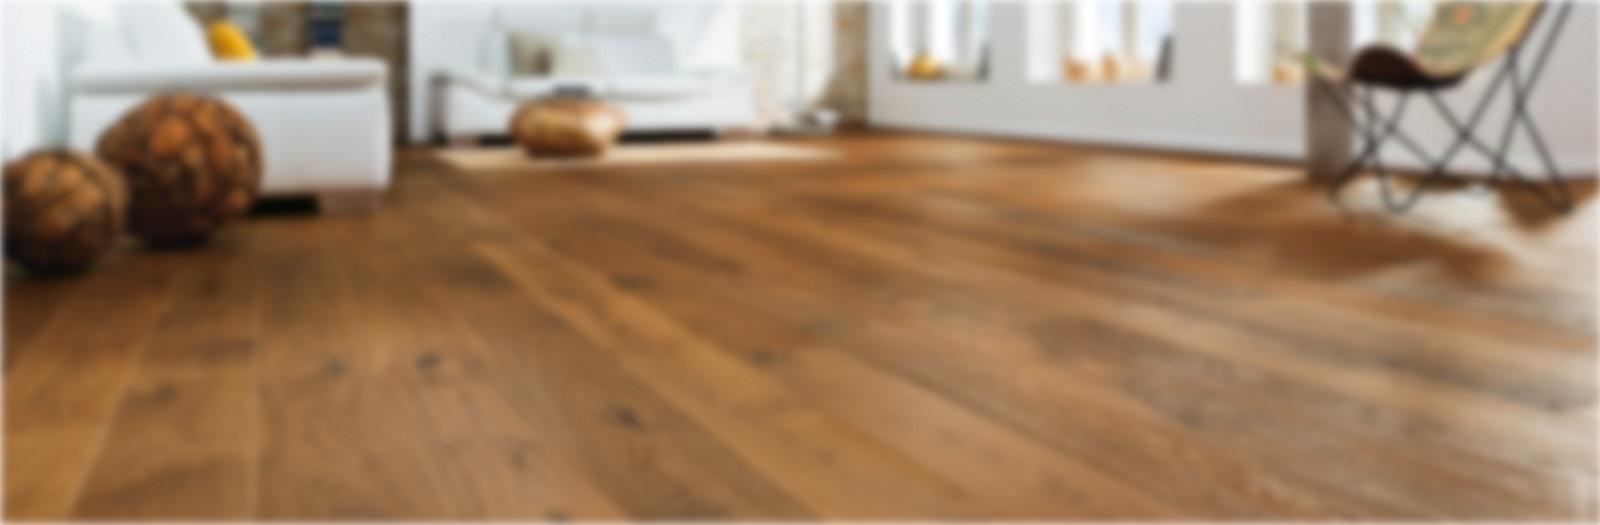 Fabricantes parquet maderea - Suelo de madera ...